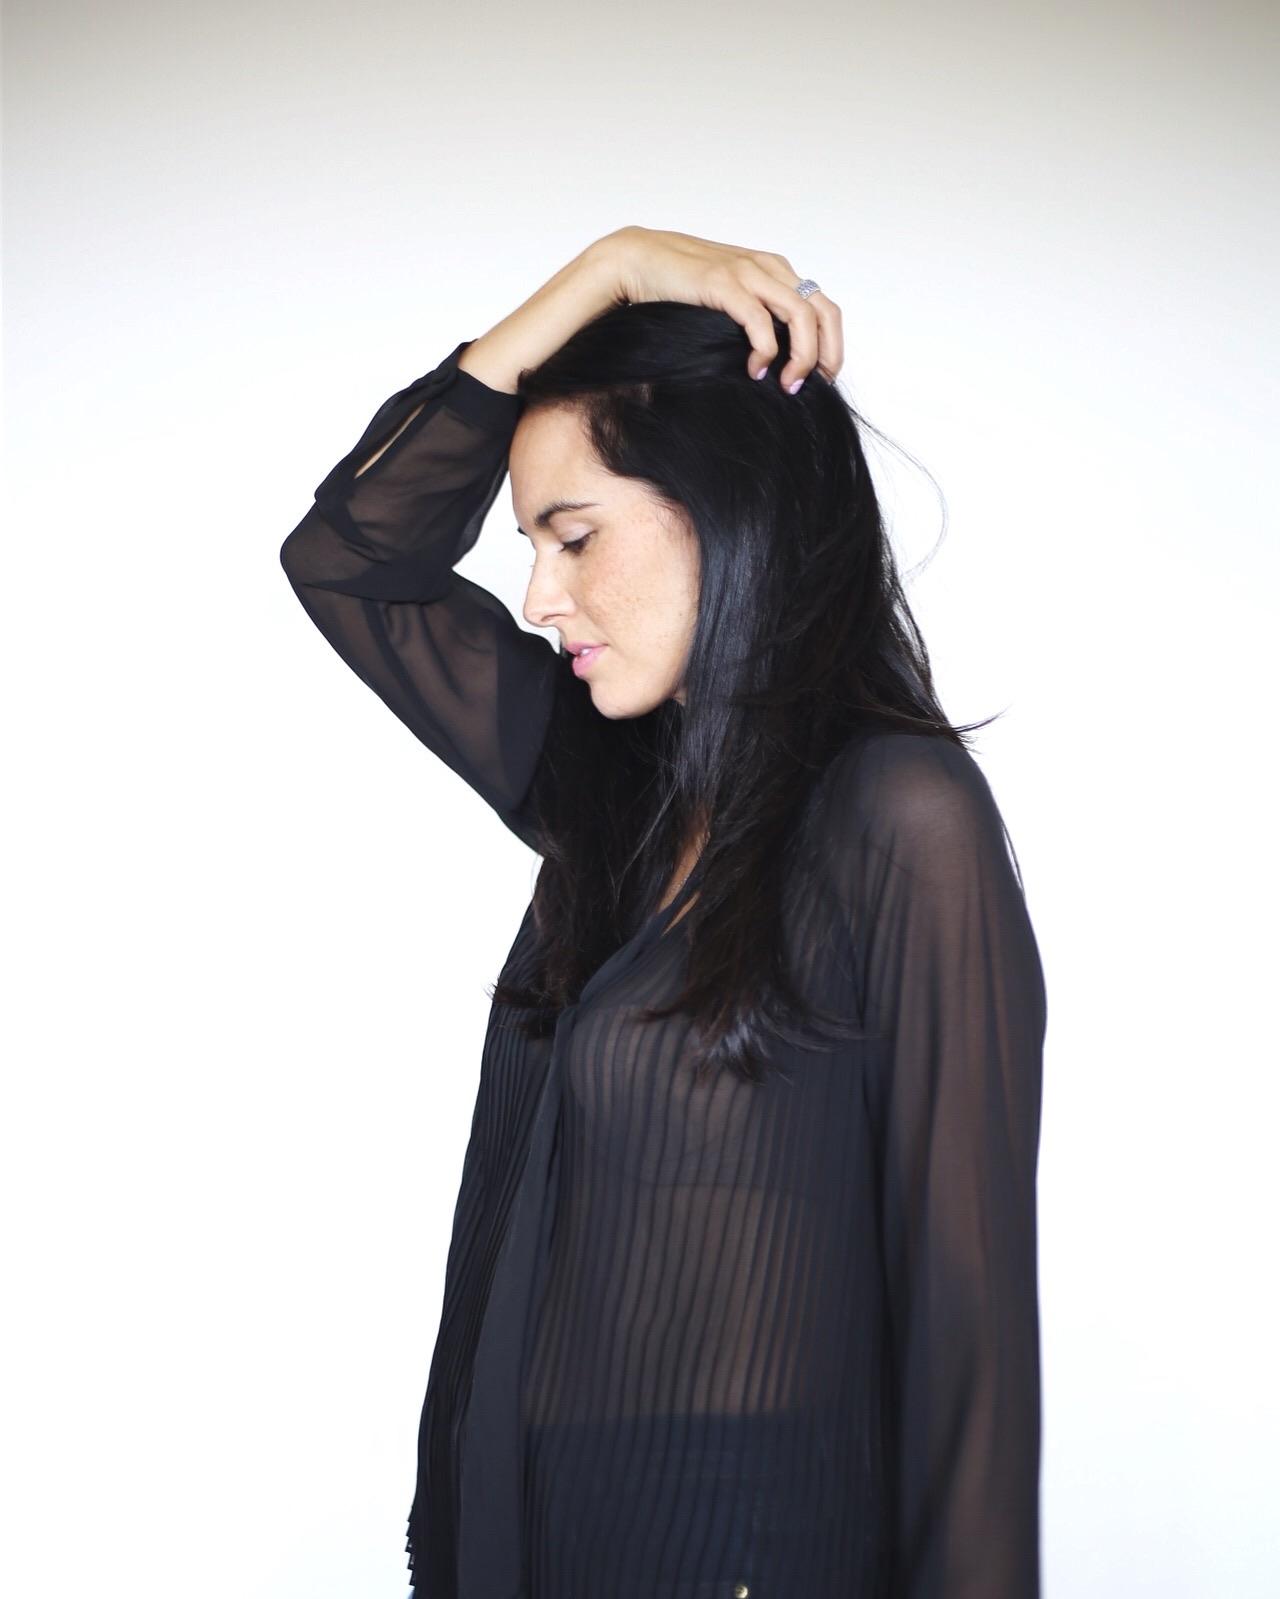   sheer blouse  similar    photo by SYDNEY CLAWSON